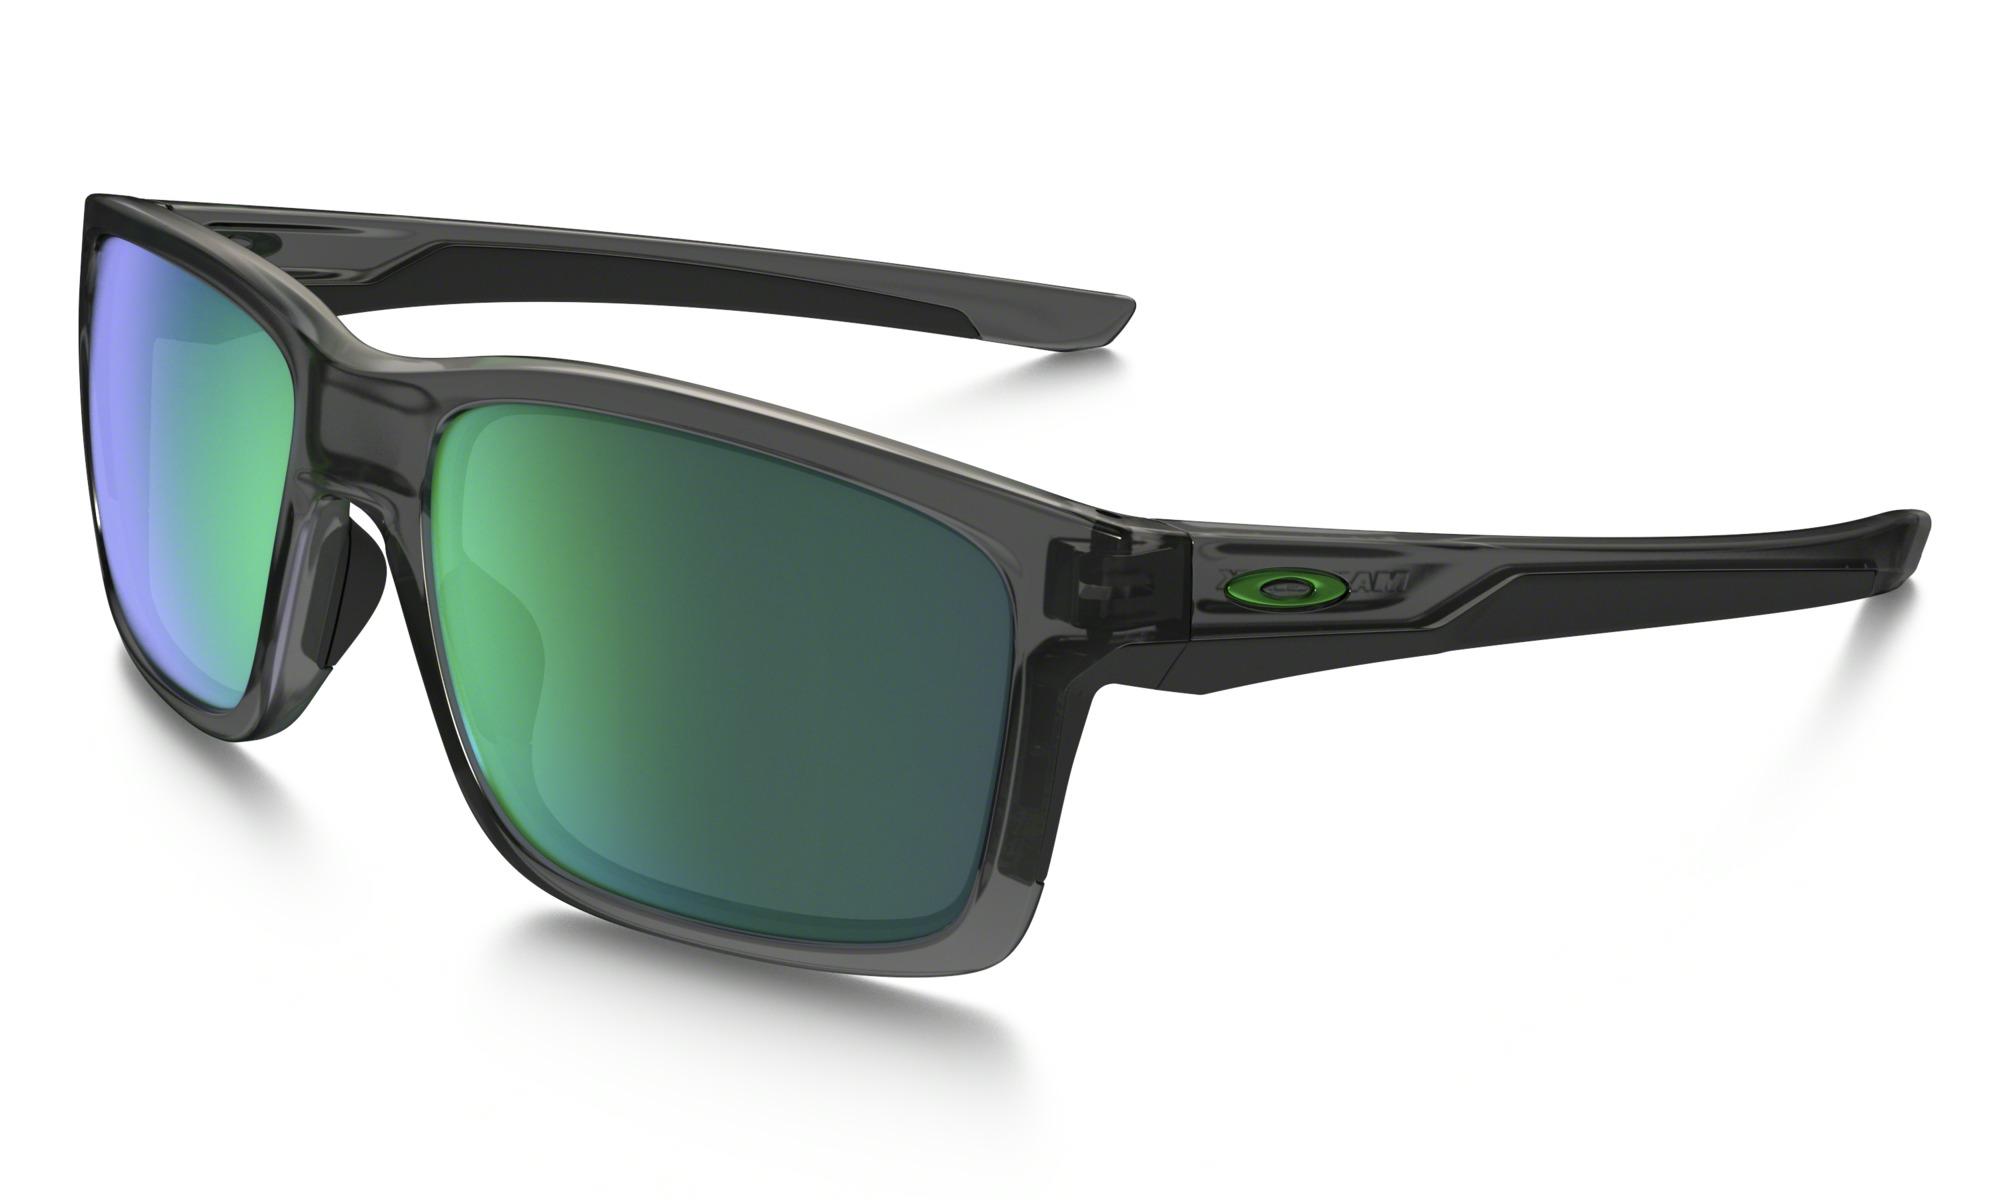 1639a51586771 Oakley Mainlink High Prescription Cycling Sunglasses